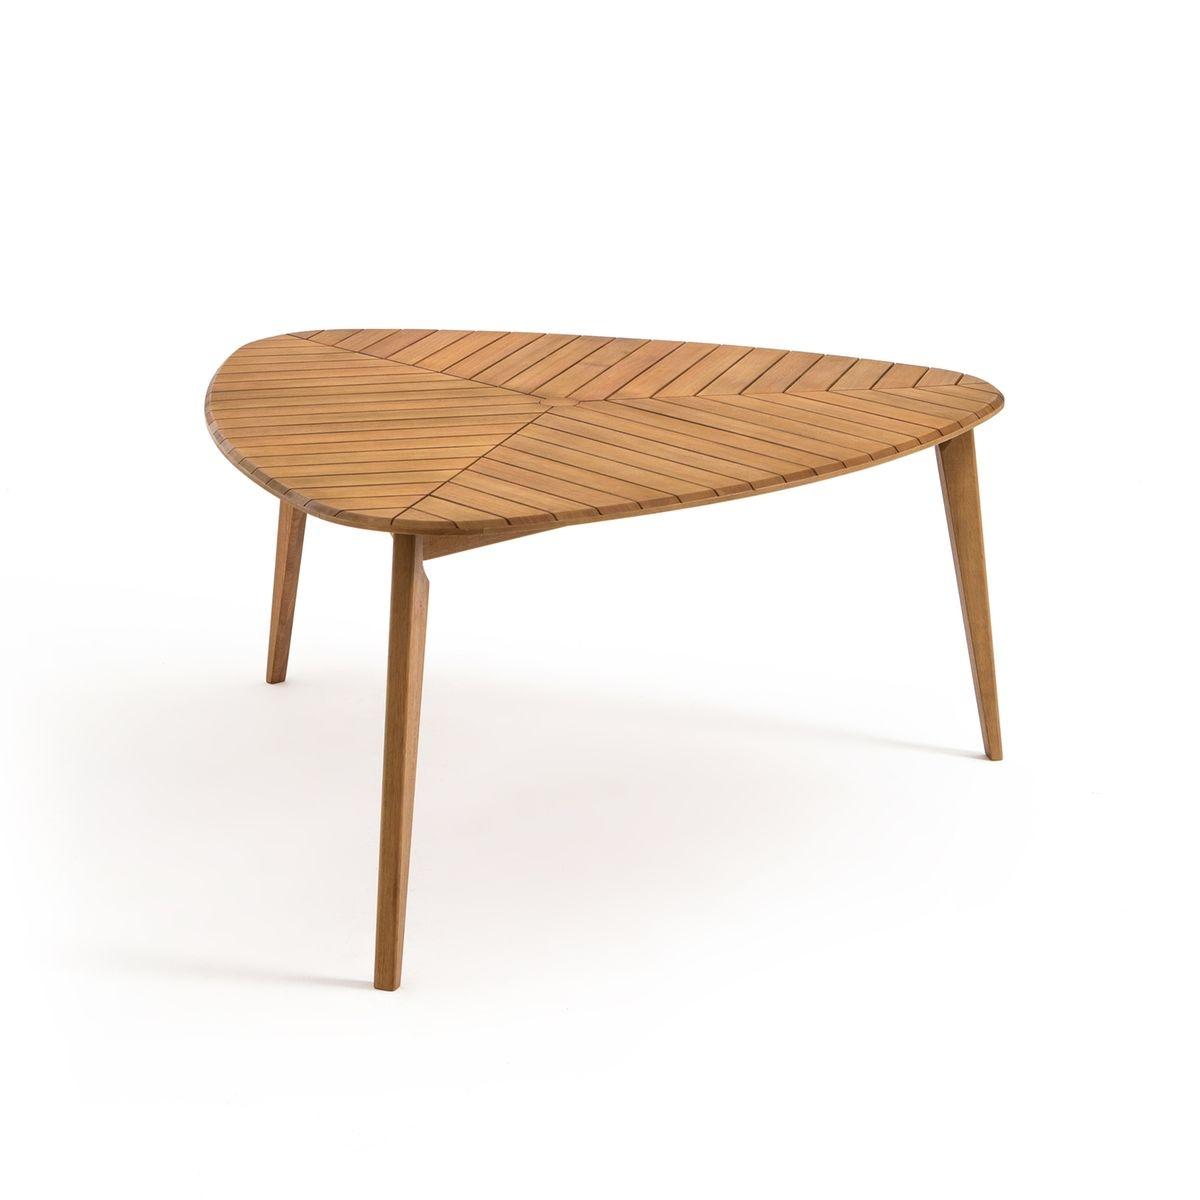 35 sur table de jardin eucalyptus marsham vendu par la redoute 21804529. Black Bedroom Furniture Sets. Home Design Ideas